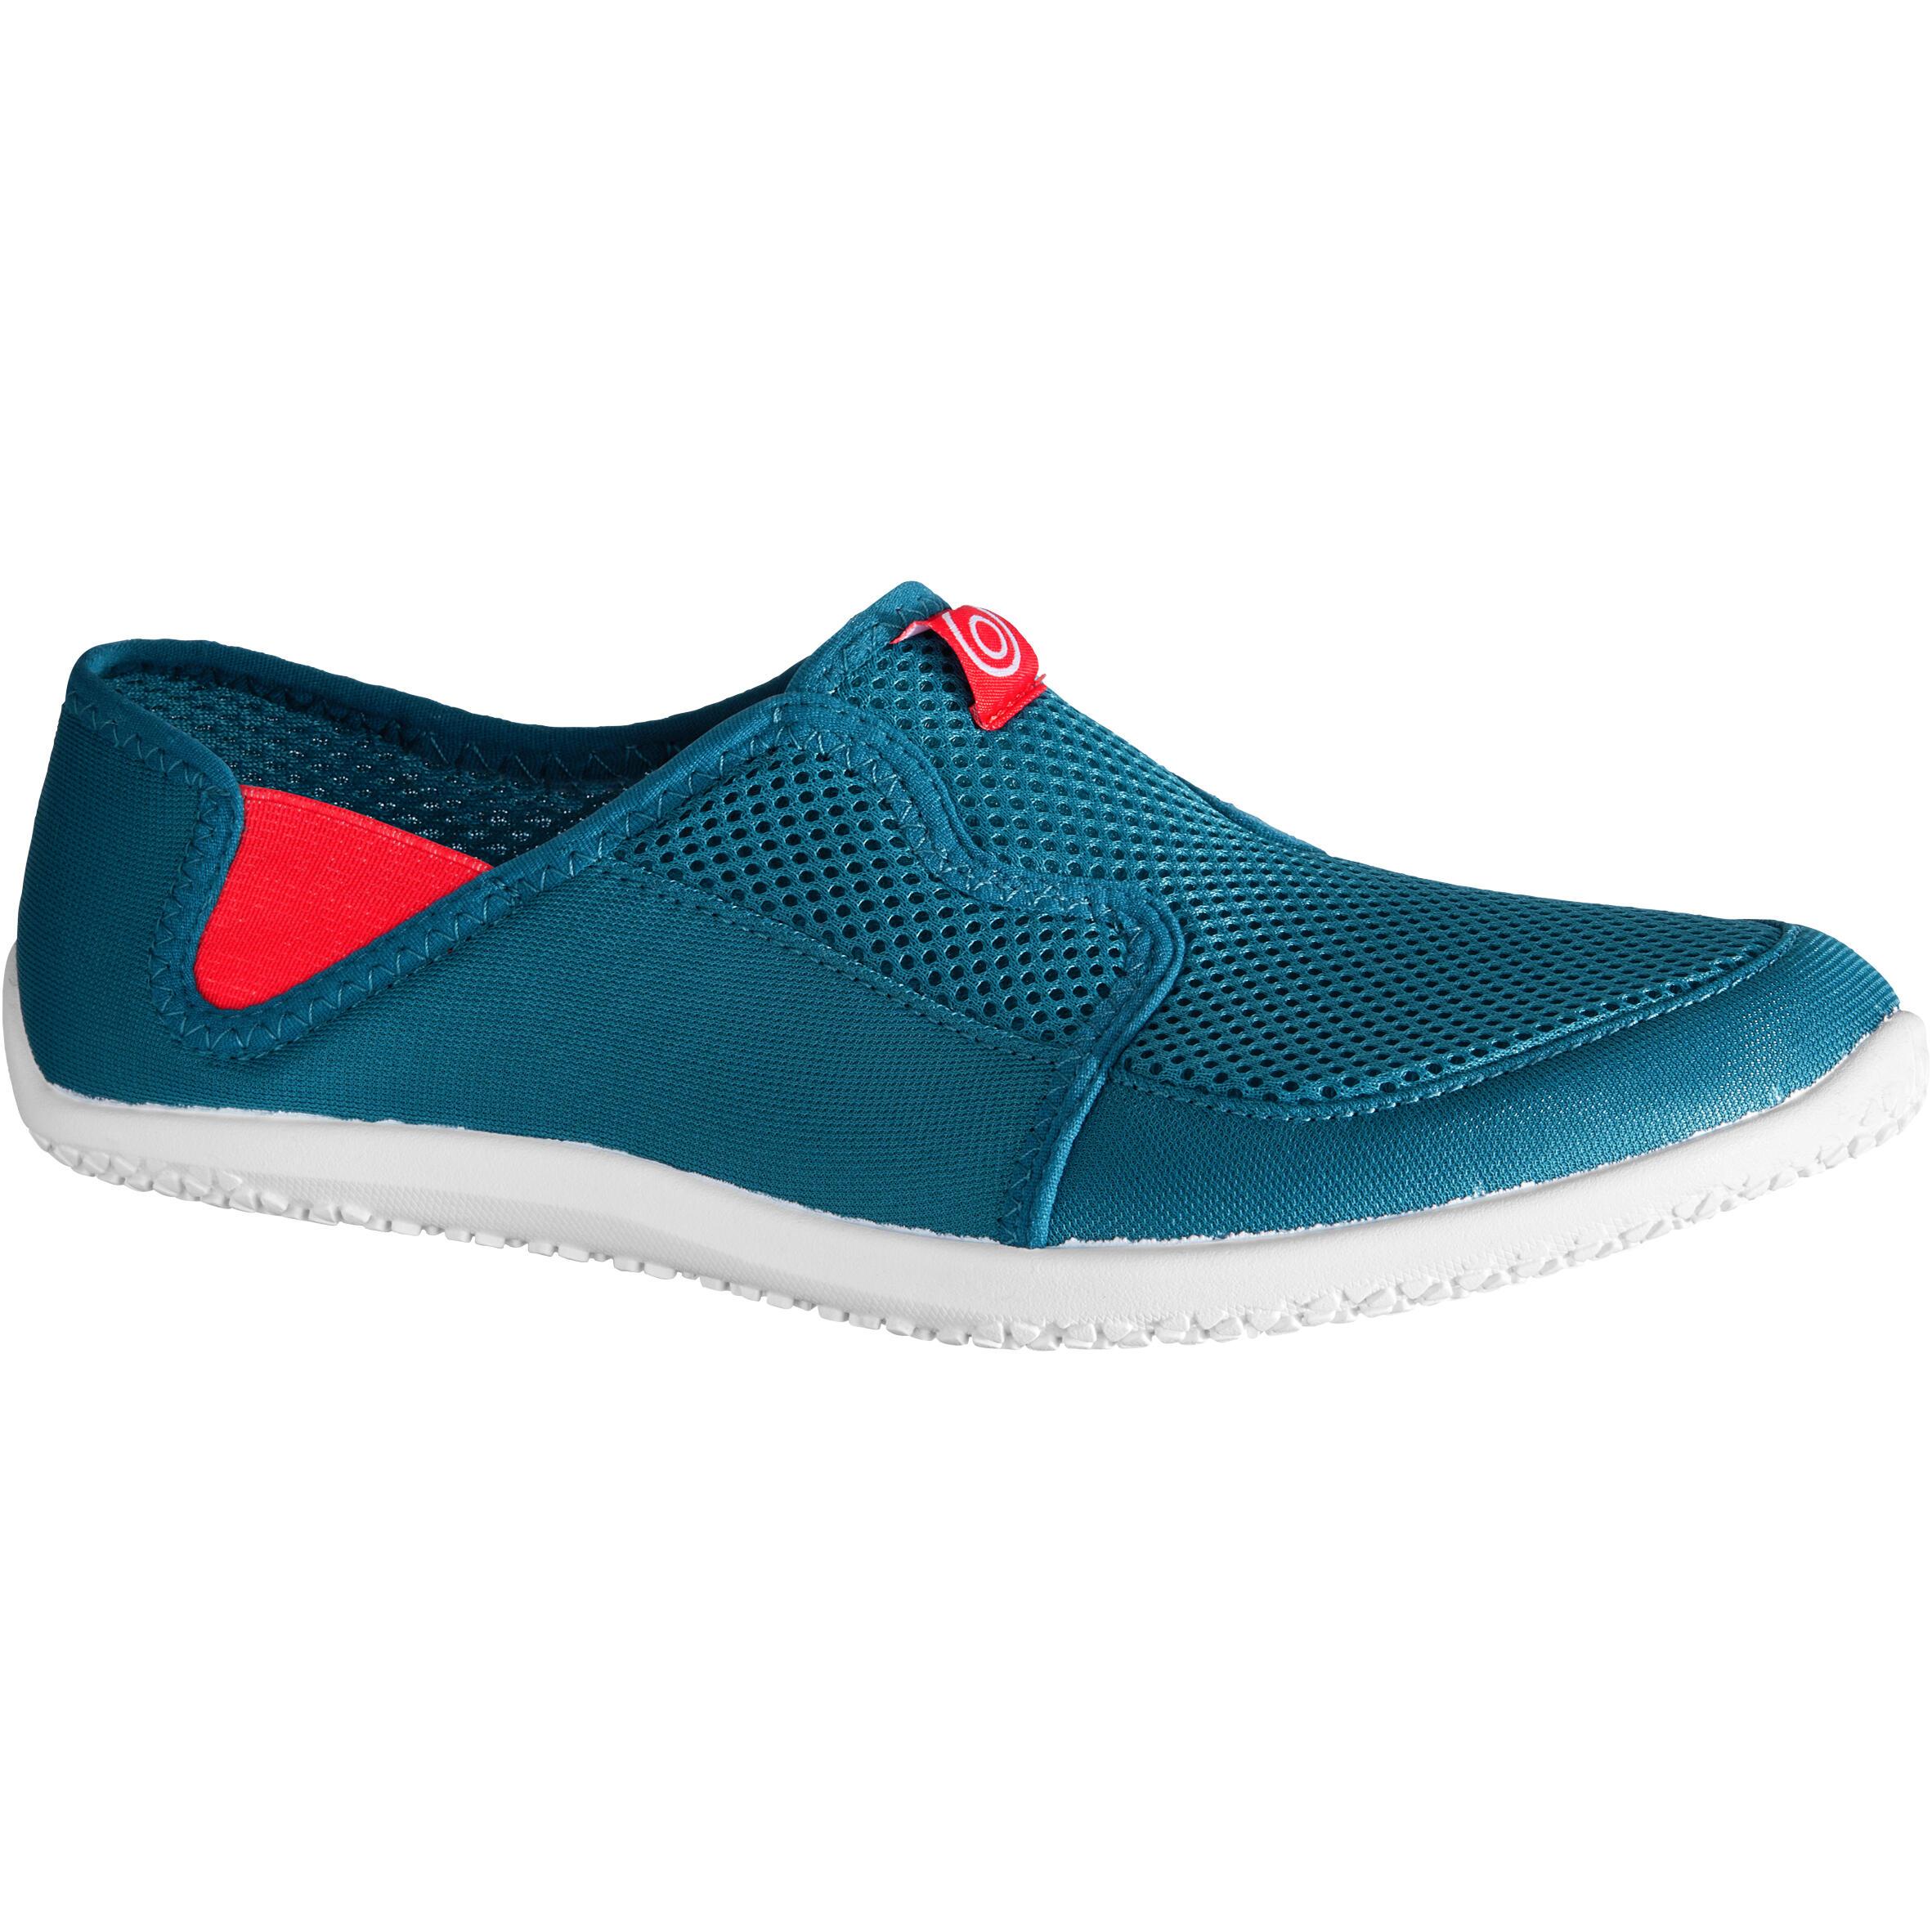 Adult Aquashoes 120 - Blue Red - Decathlon